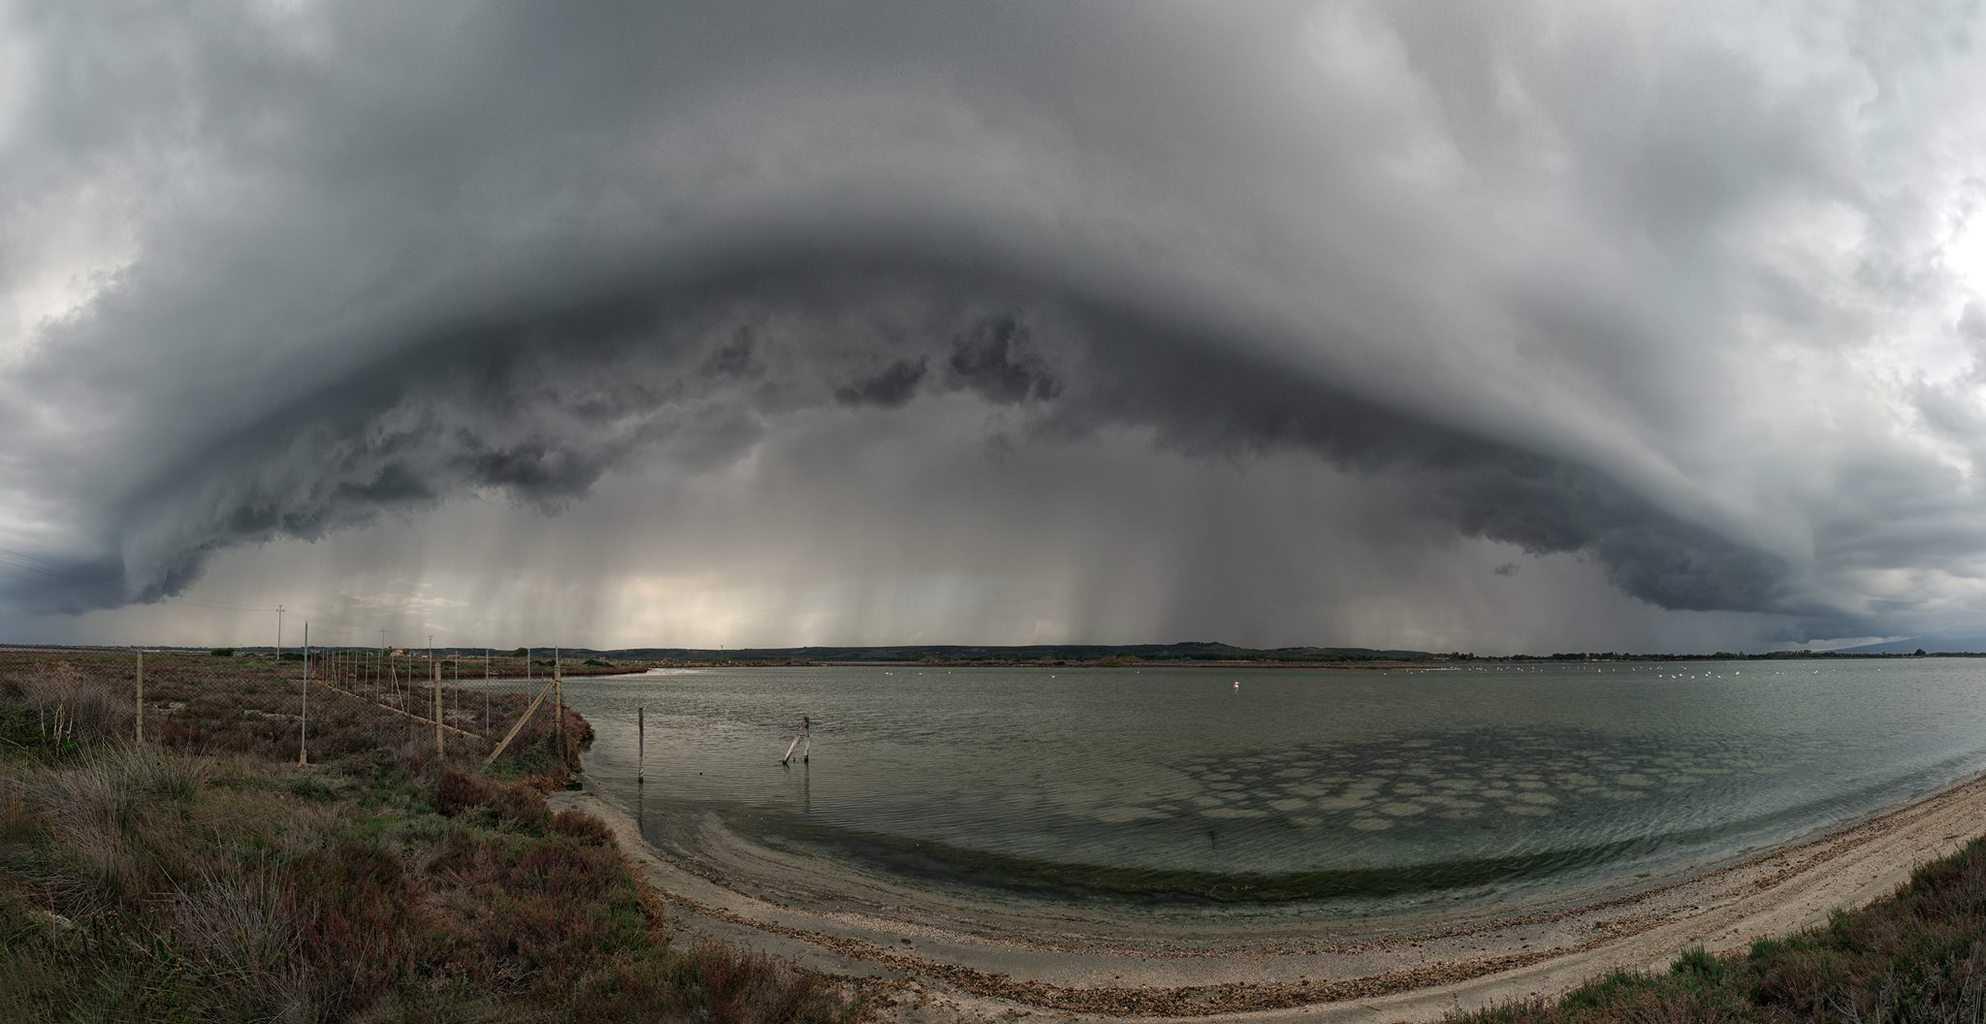 Shelf Cloud Sardegna 26 12 2018